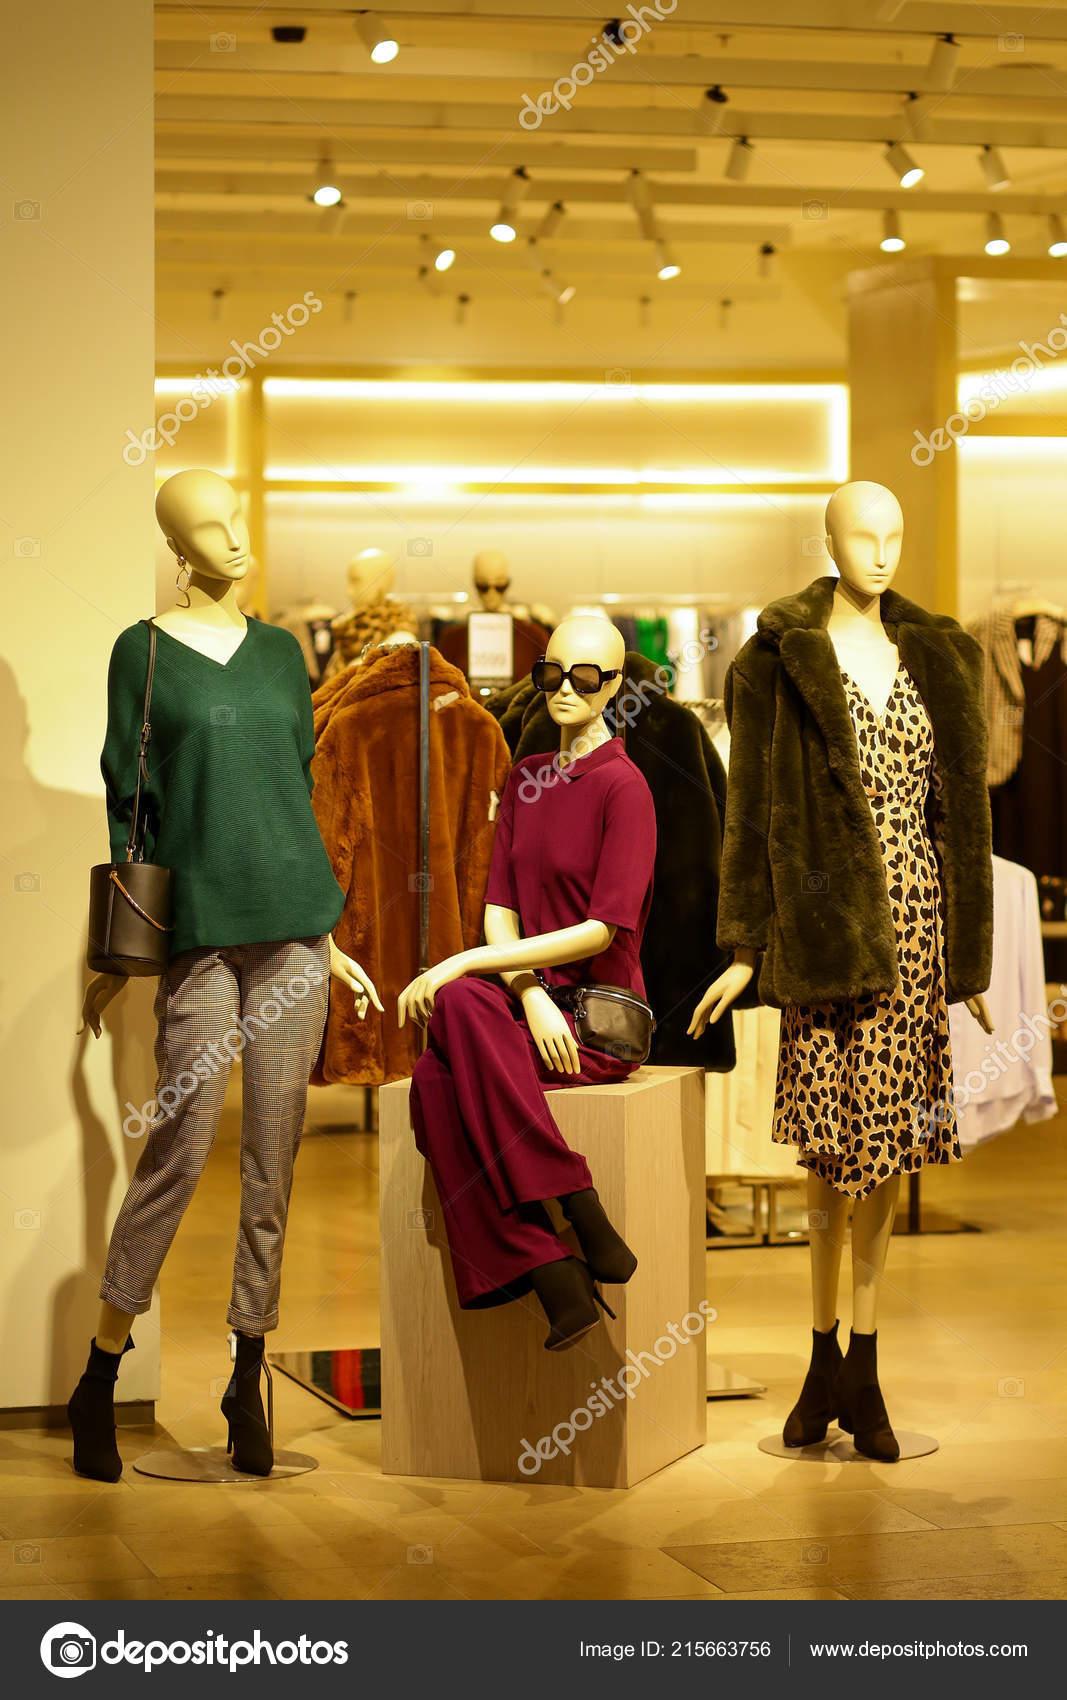 9669188cd8e Mannequins Fashion Accessories Shop Window Showcase Store Mall Market —  Stock Photo